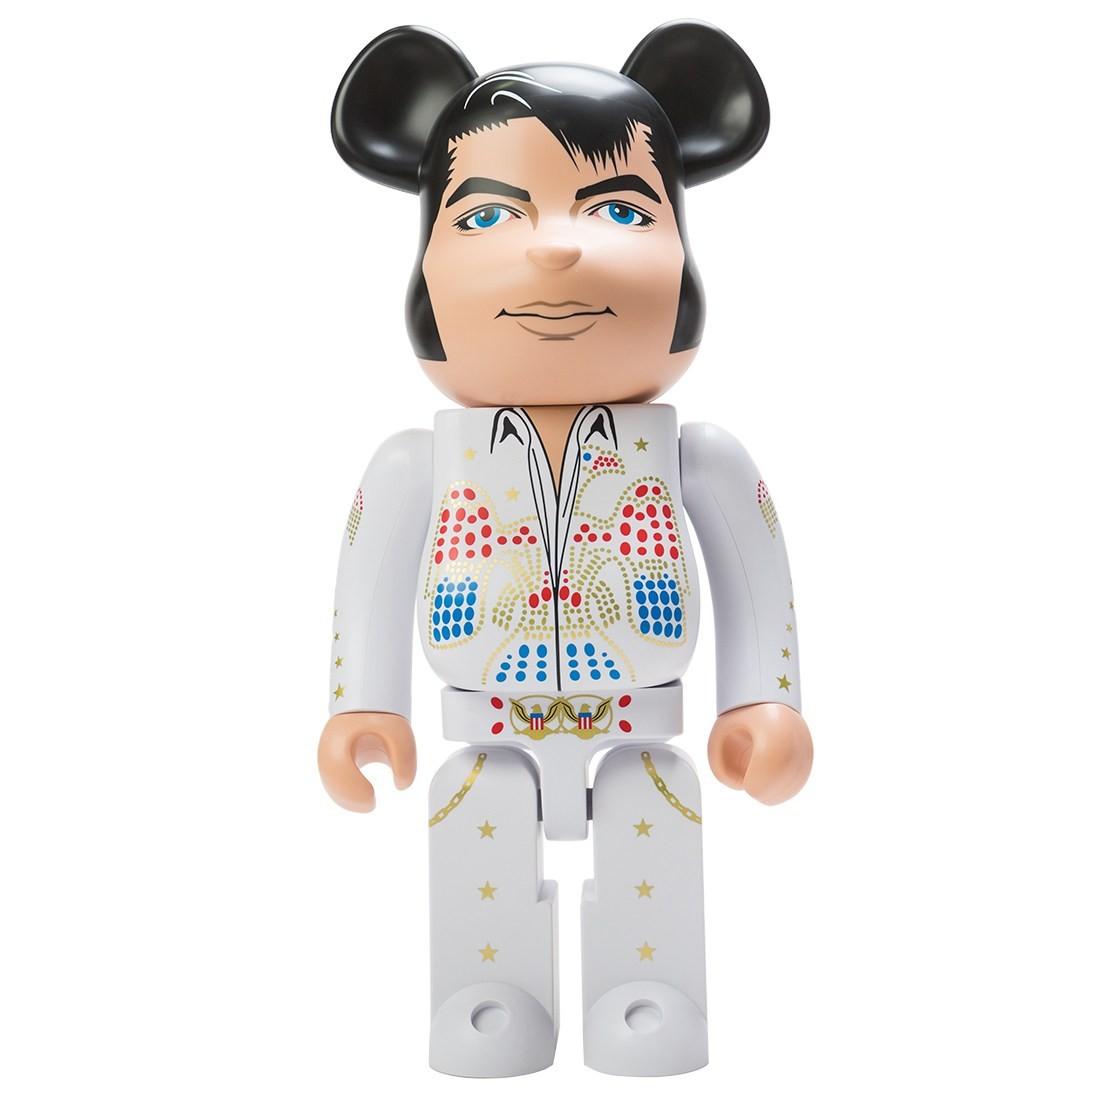 Medicom Elvis Presley 1000% Bearbrick Figure (white)